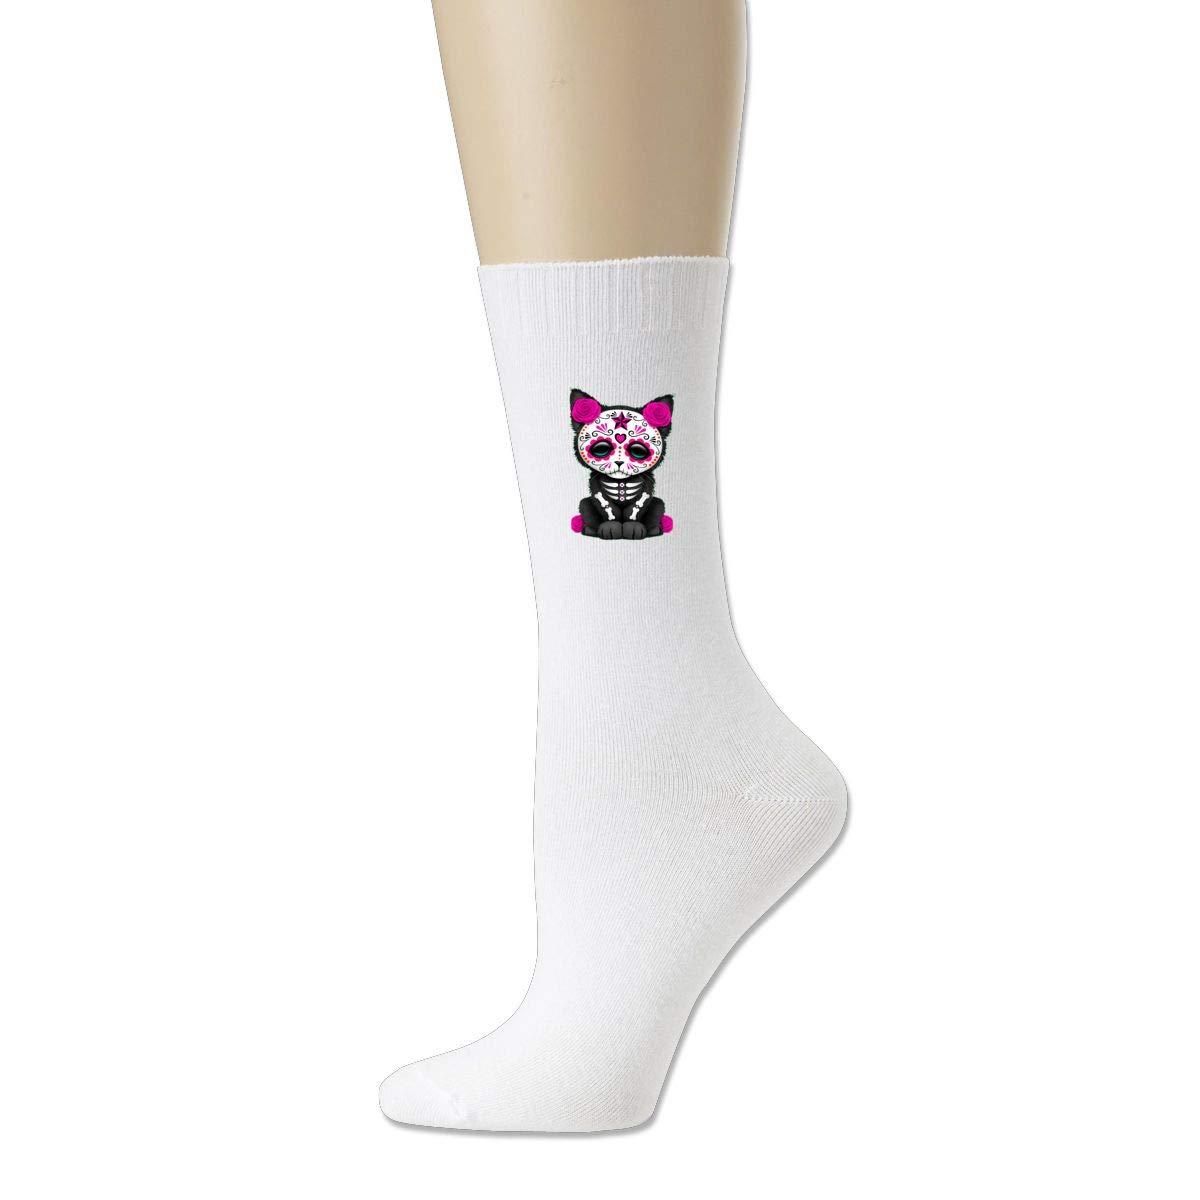 Rigg-socks Cute Red Day Of The Dead Kitten Cat Mens Comfortable Sport Socks Black